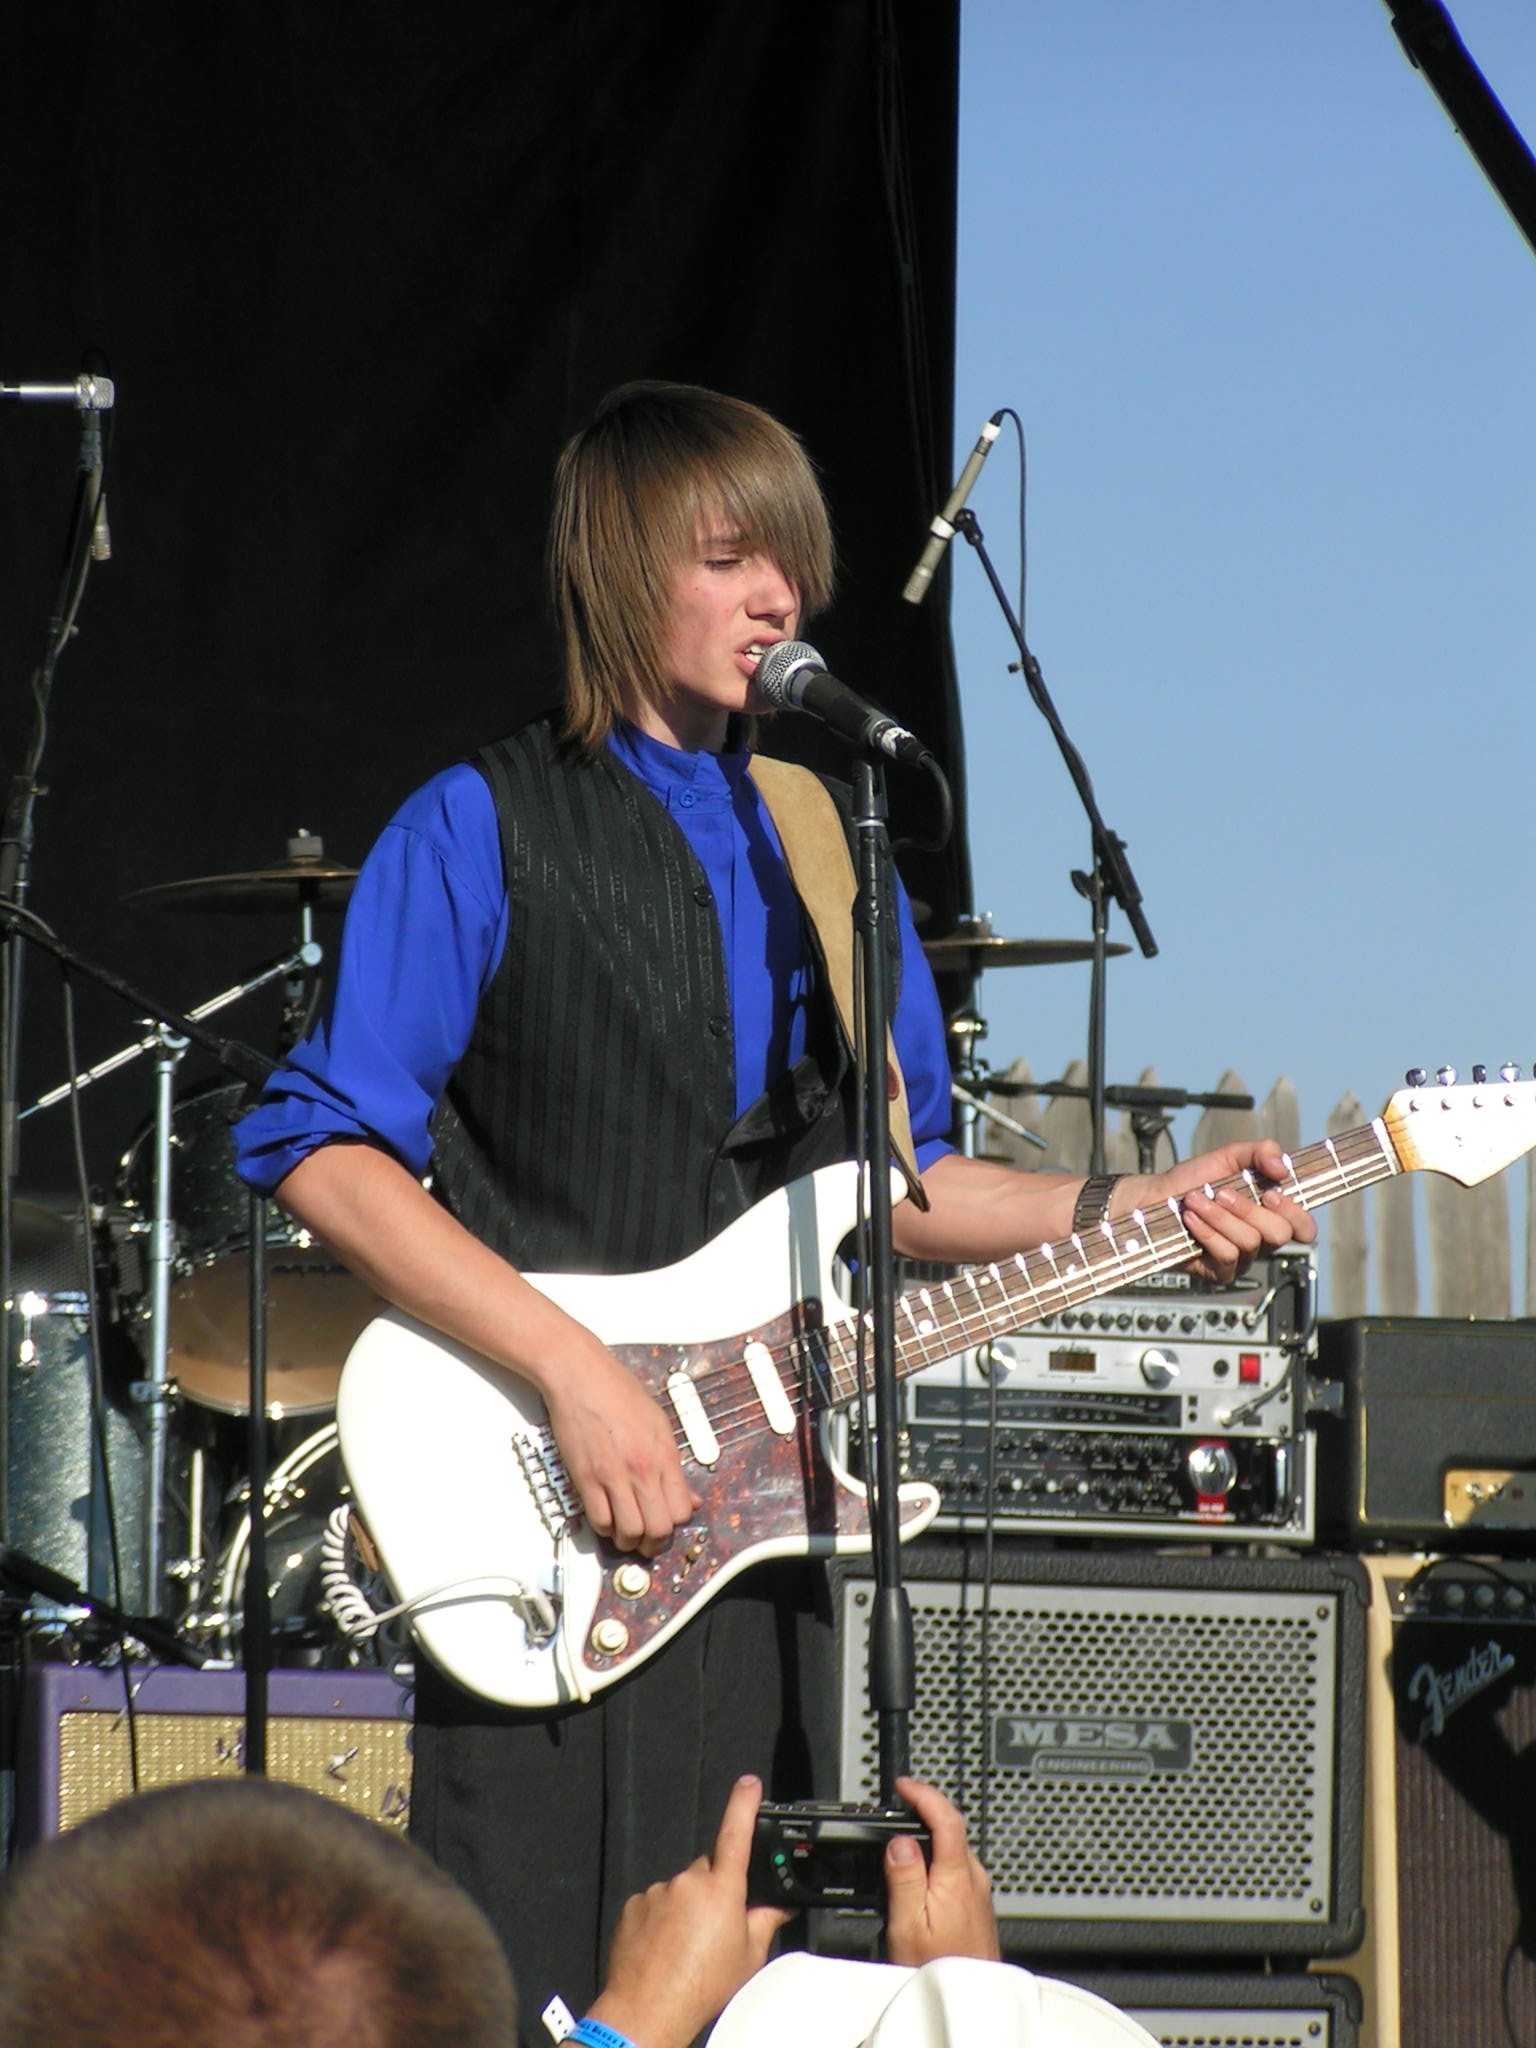 Mammon Family Pinedale Blues Fest 06 20